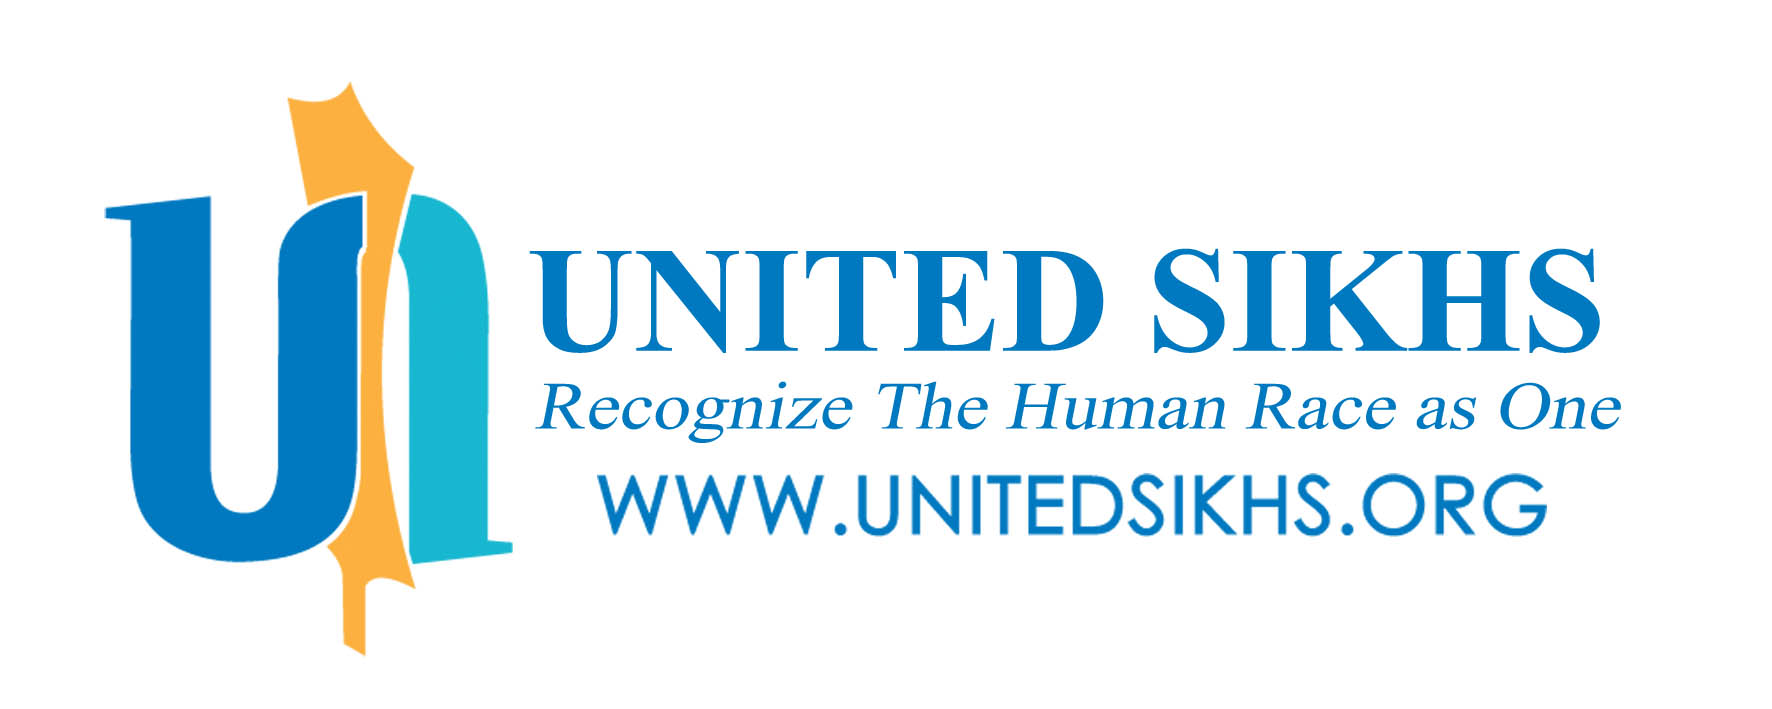 Logo of charity UNITED SIKHS